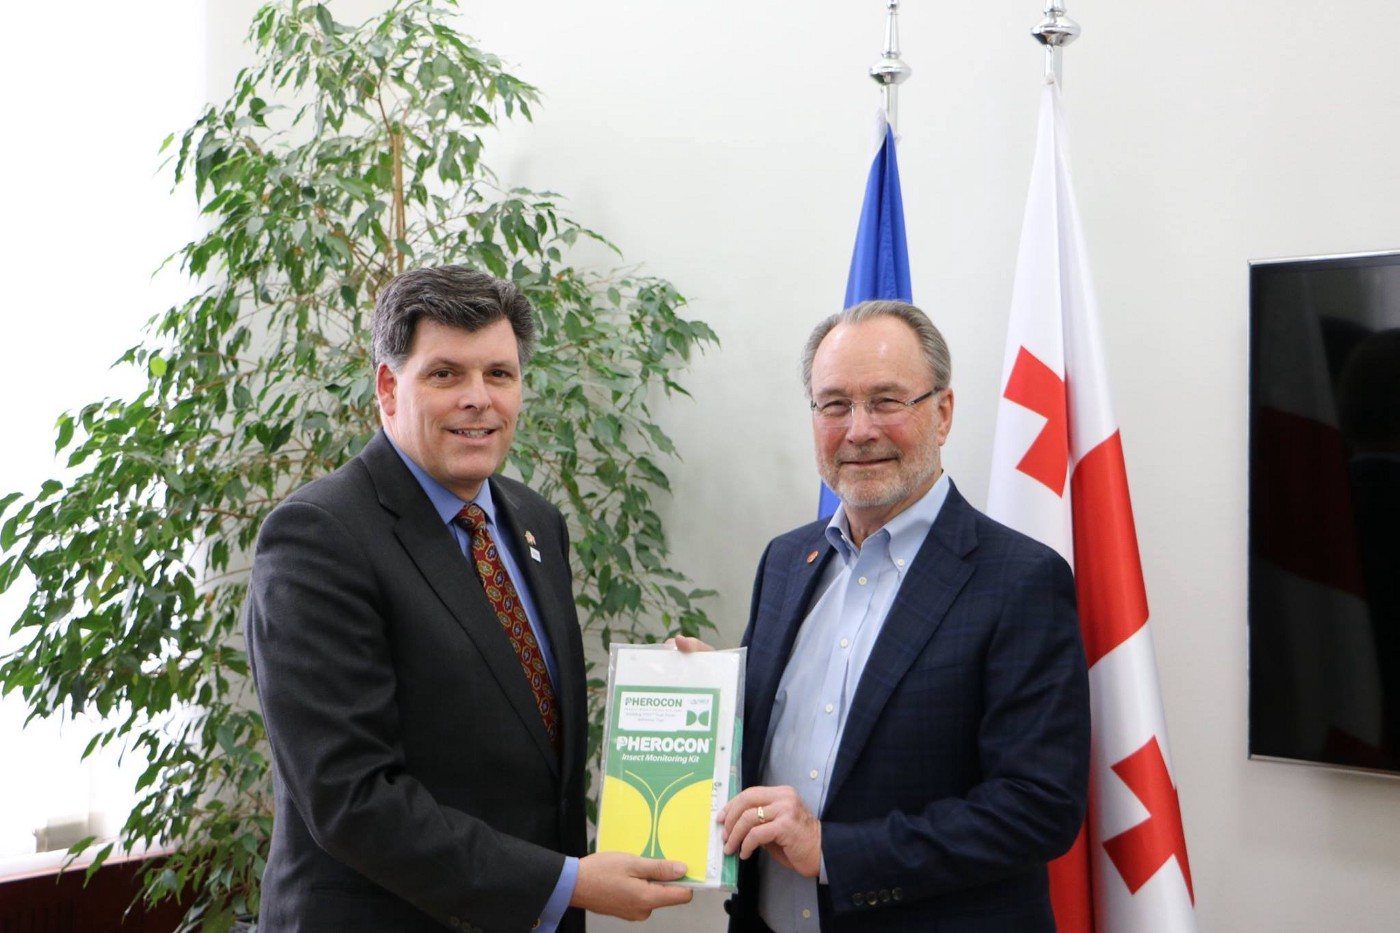 USAID Assistant Administrator Brock Bierman meets Trécé owner Bill Lingren during a visit to Georgia. / USAID/Georgia